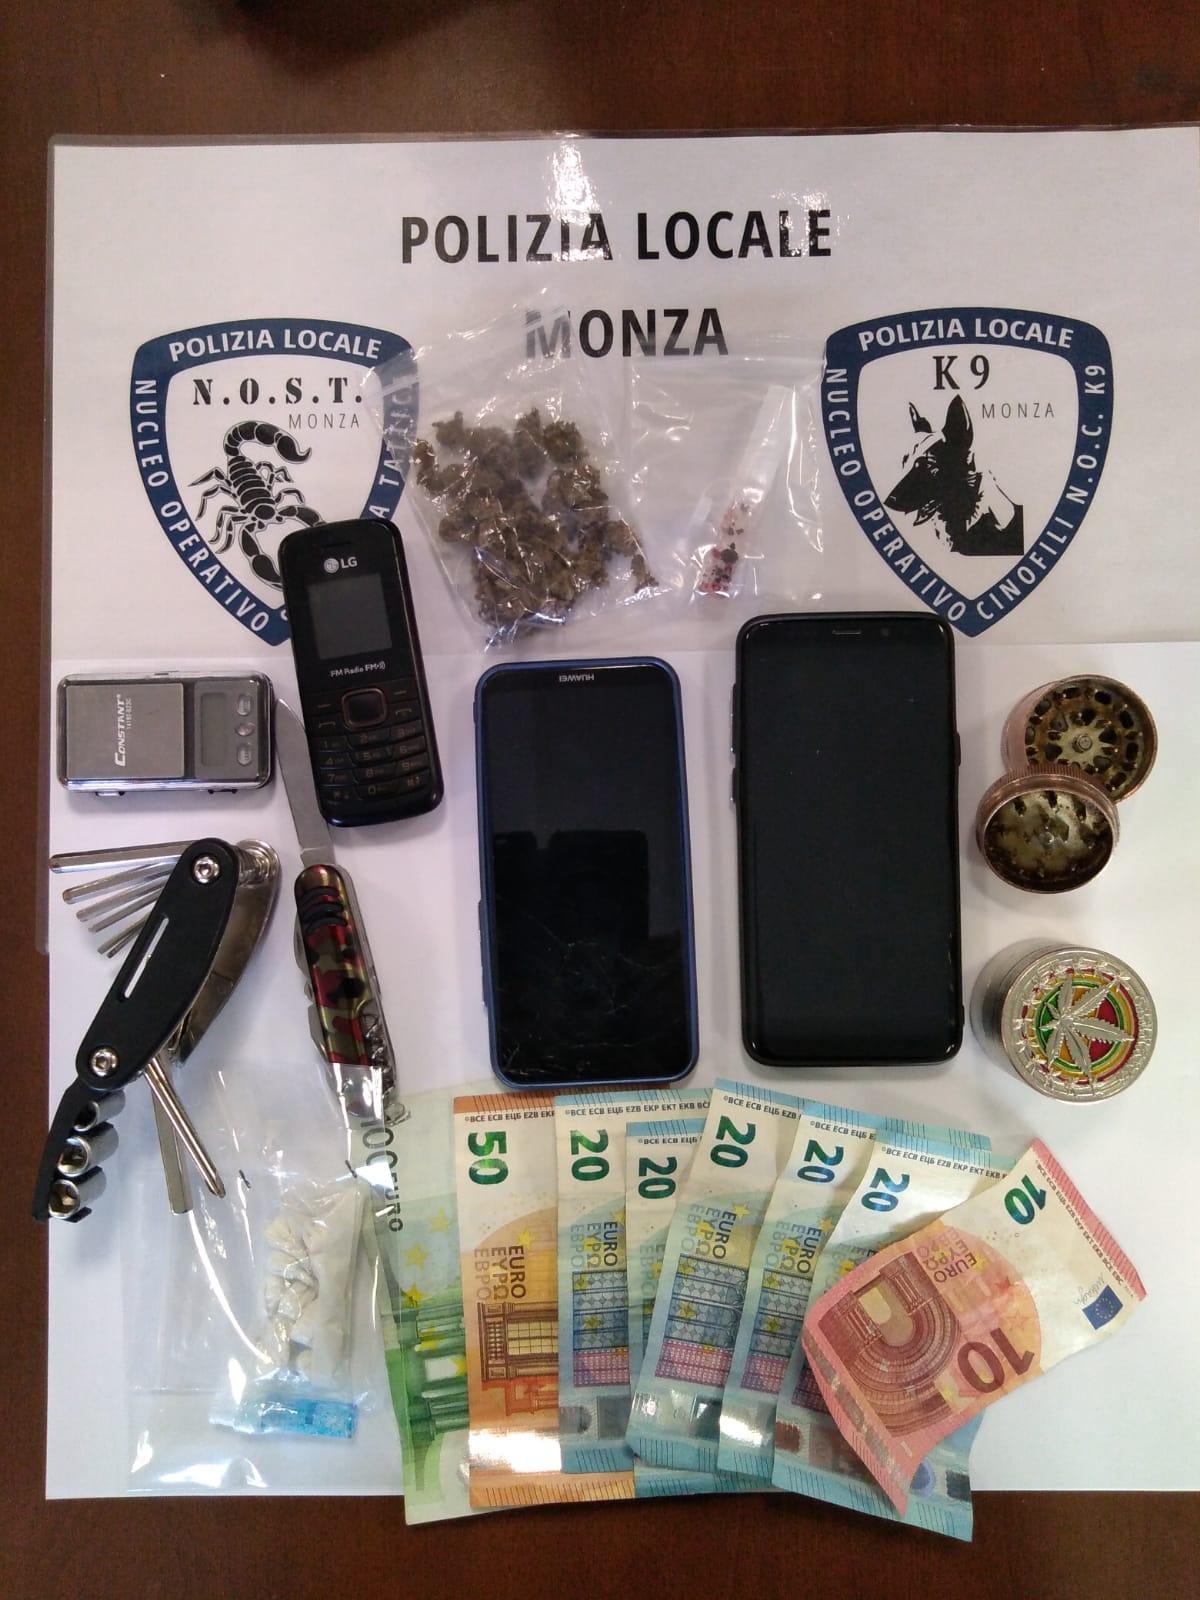 Spacciatore di cocaina arrestato in stazione a Monza